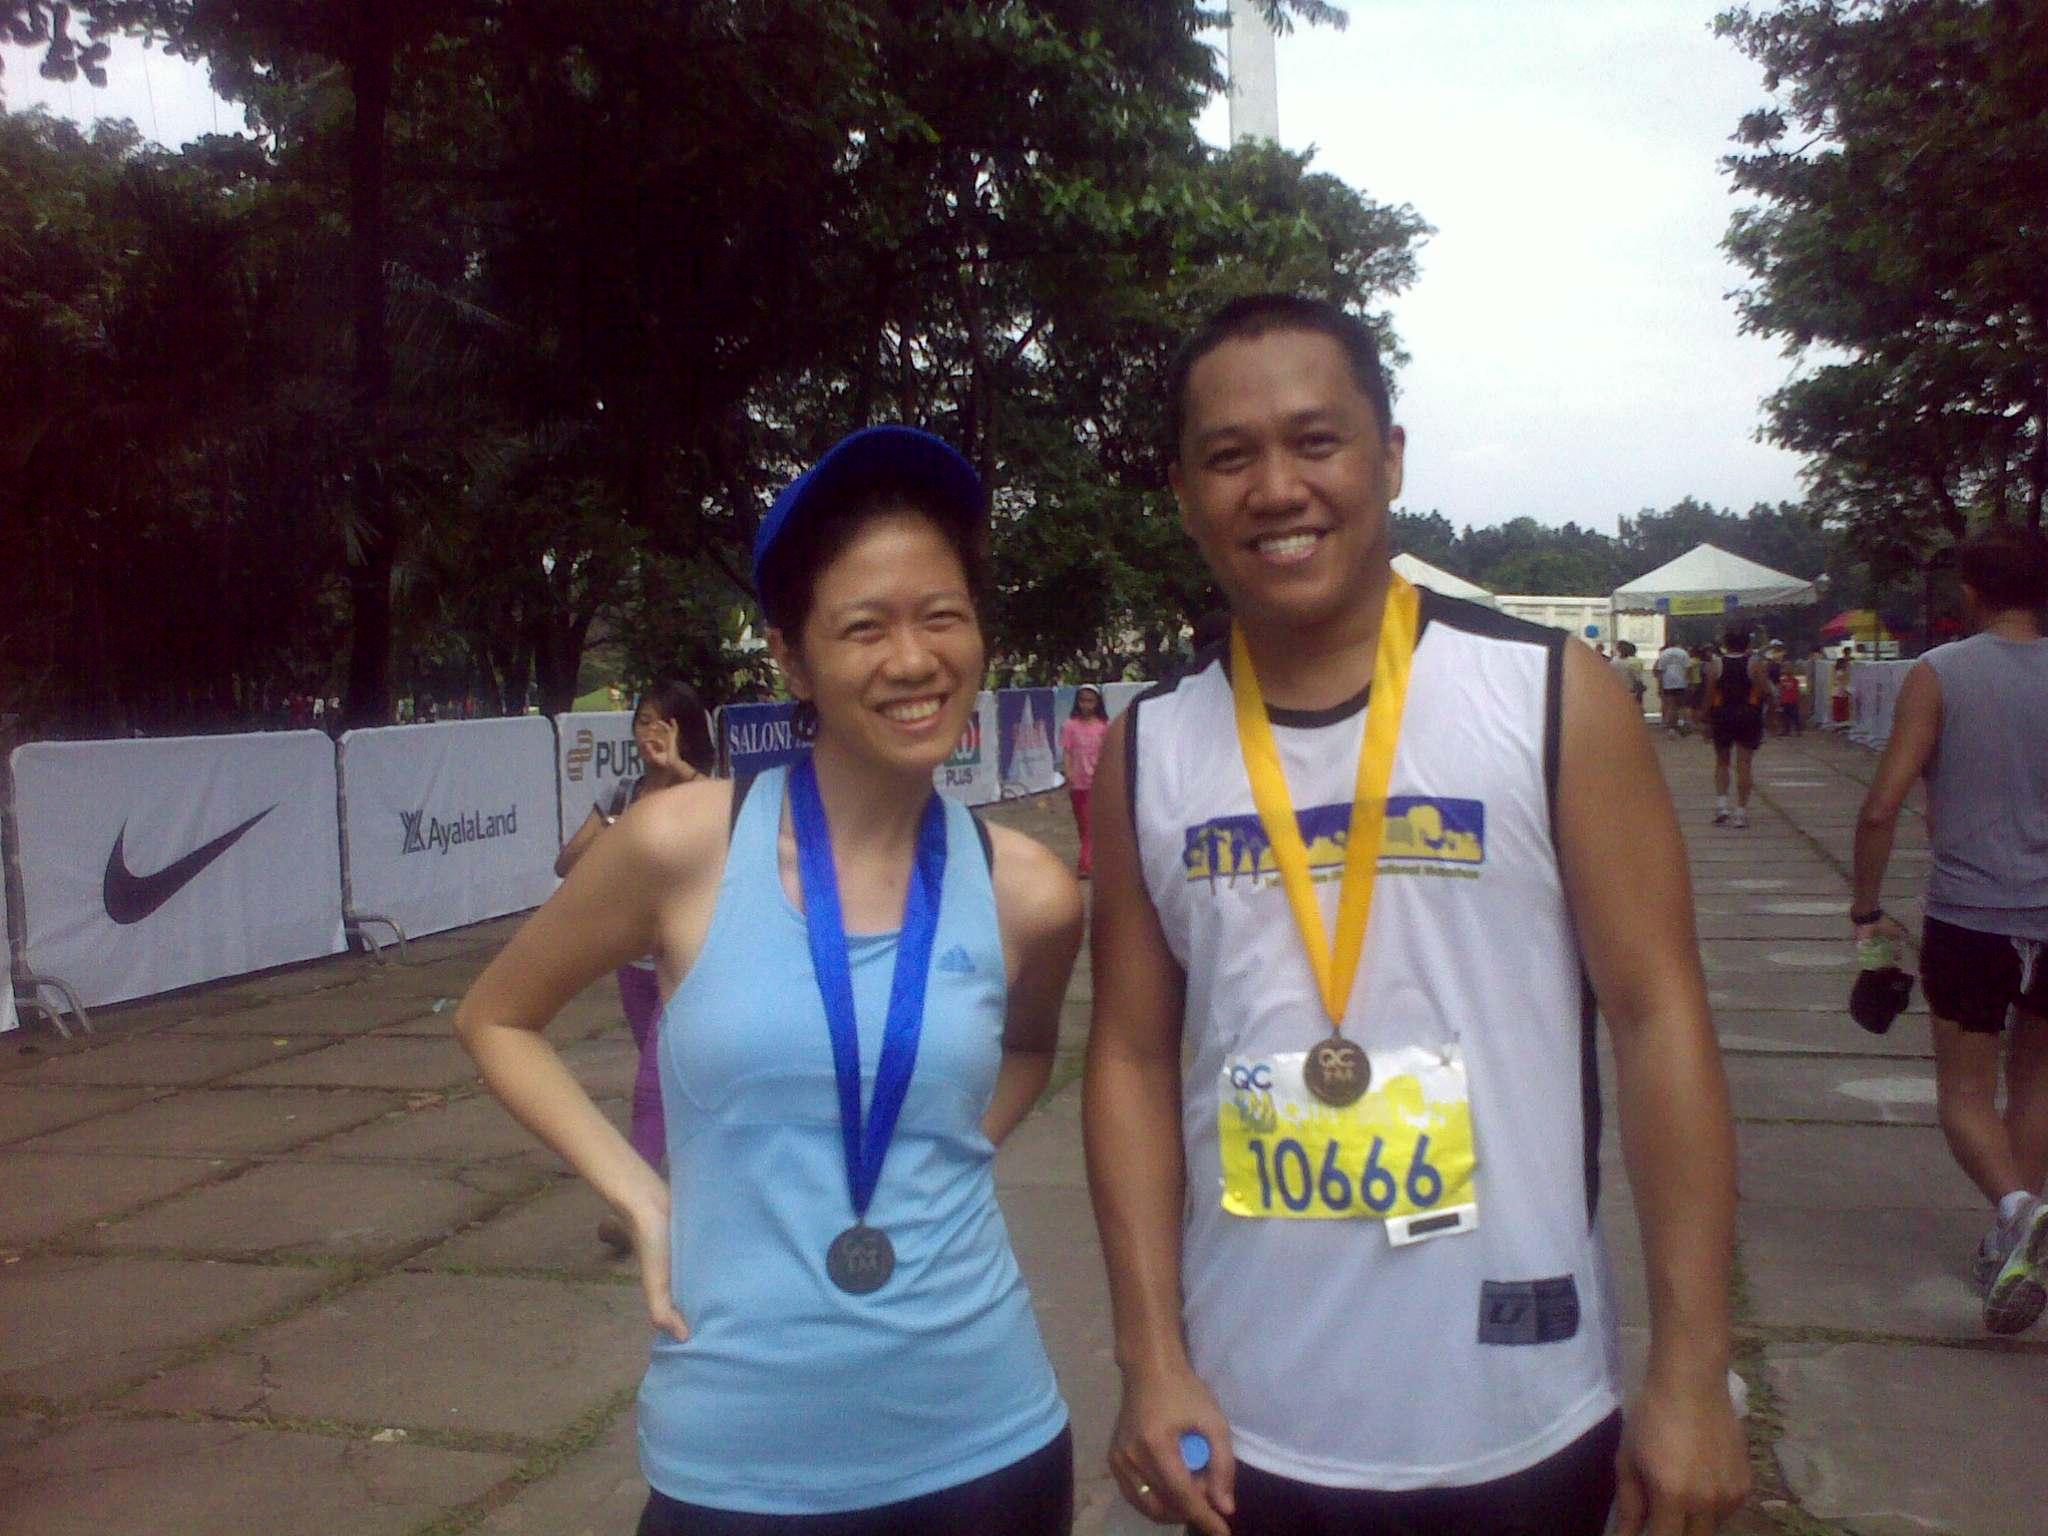 Classmate Jobaqs-Cramming 101!Congrats on your first Marathon!